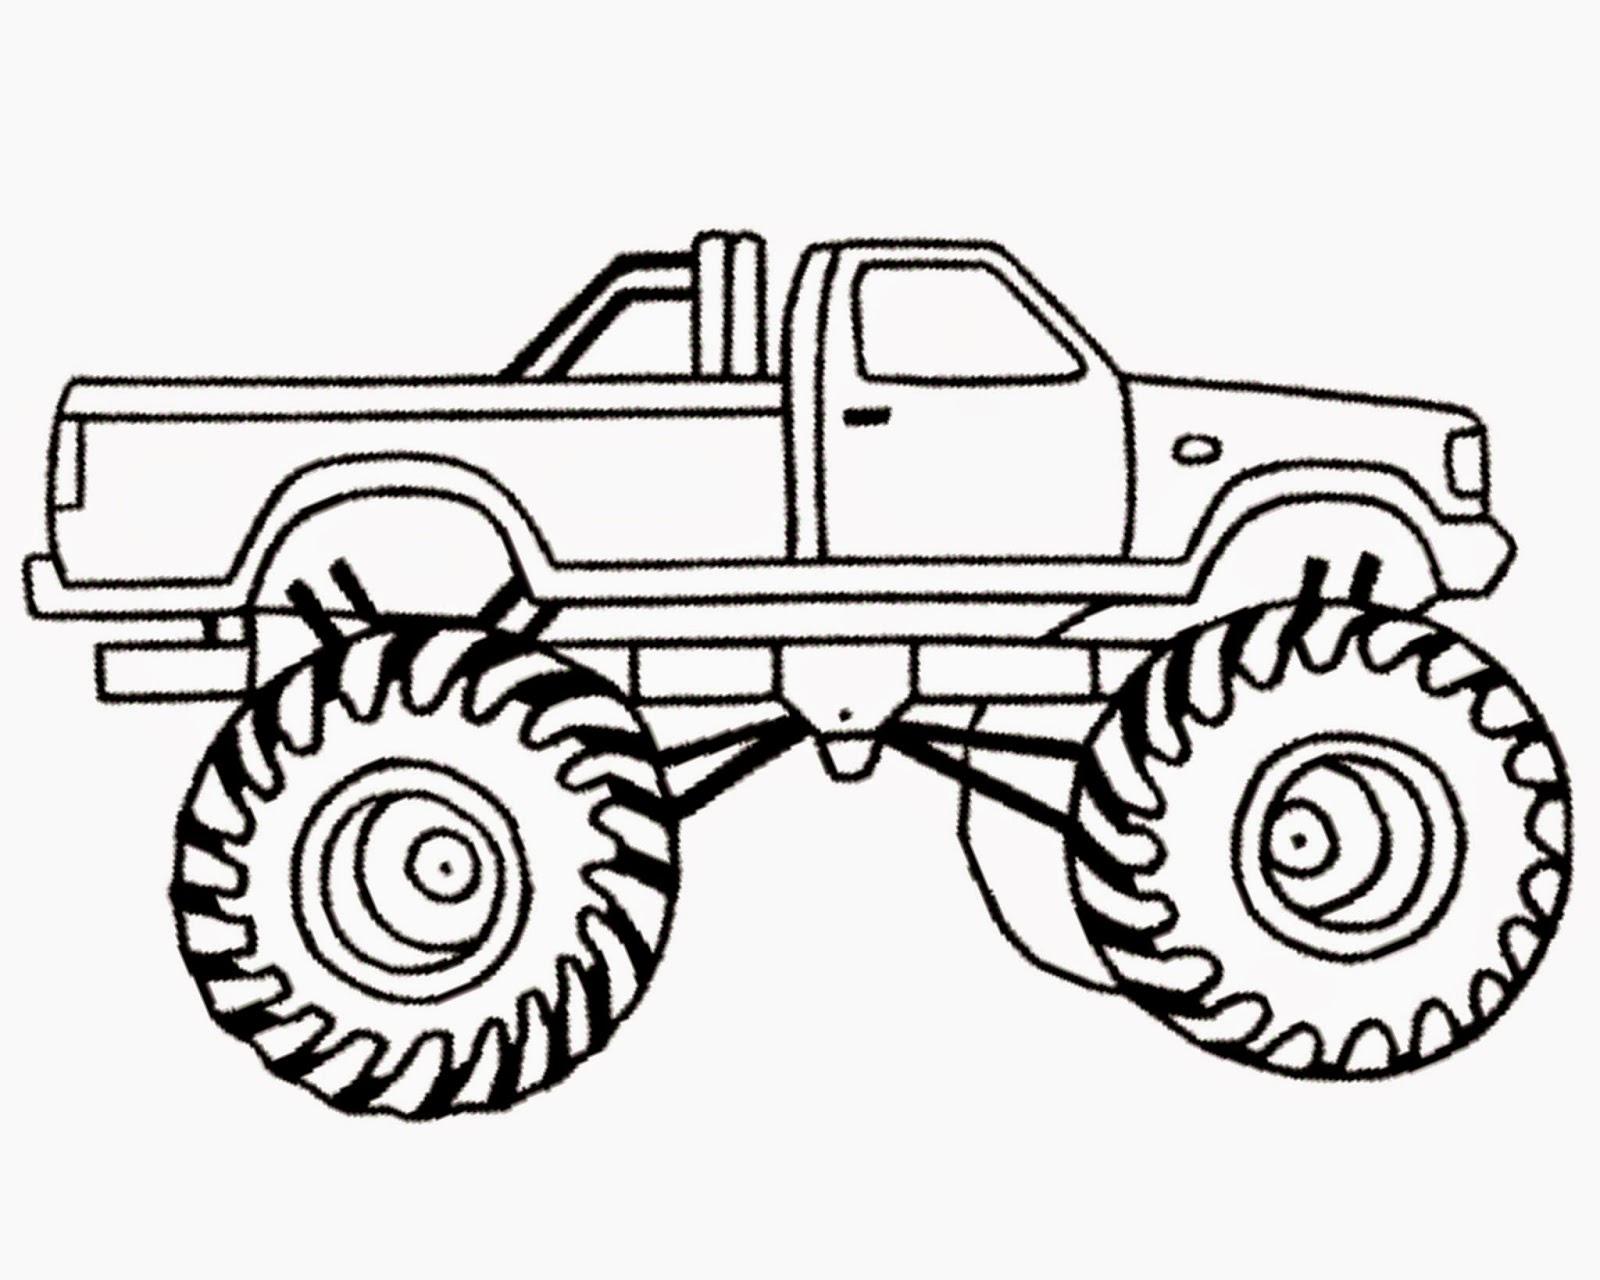 monster truck clipart free free download best monster truck Lightning McQueen 95 1600x1280 stick clip art many interesting cliparts